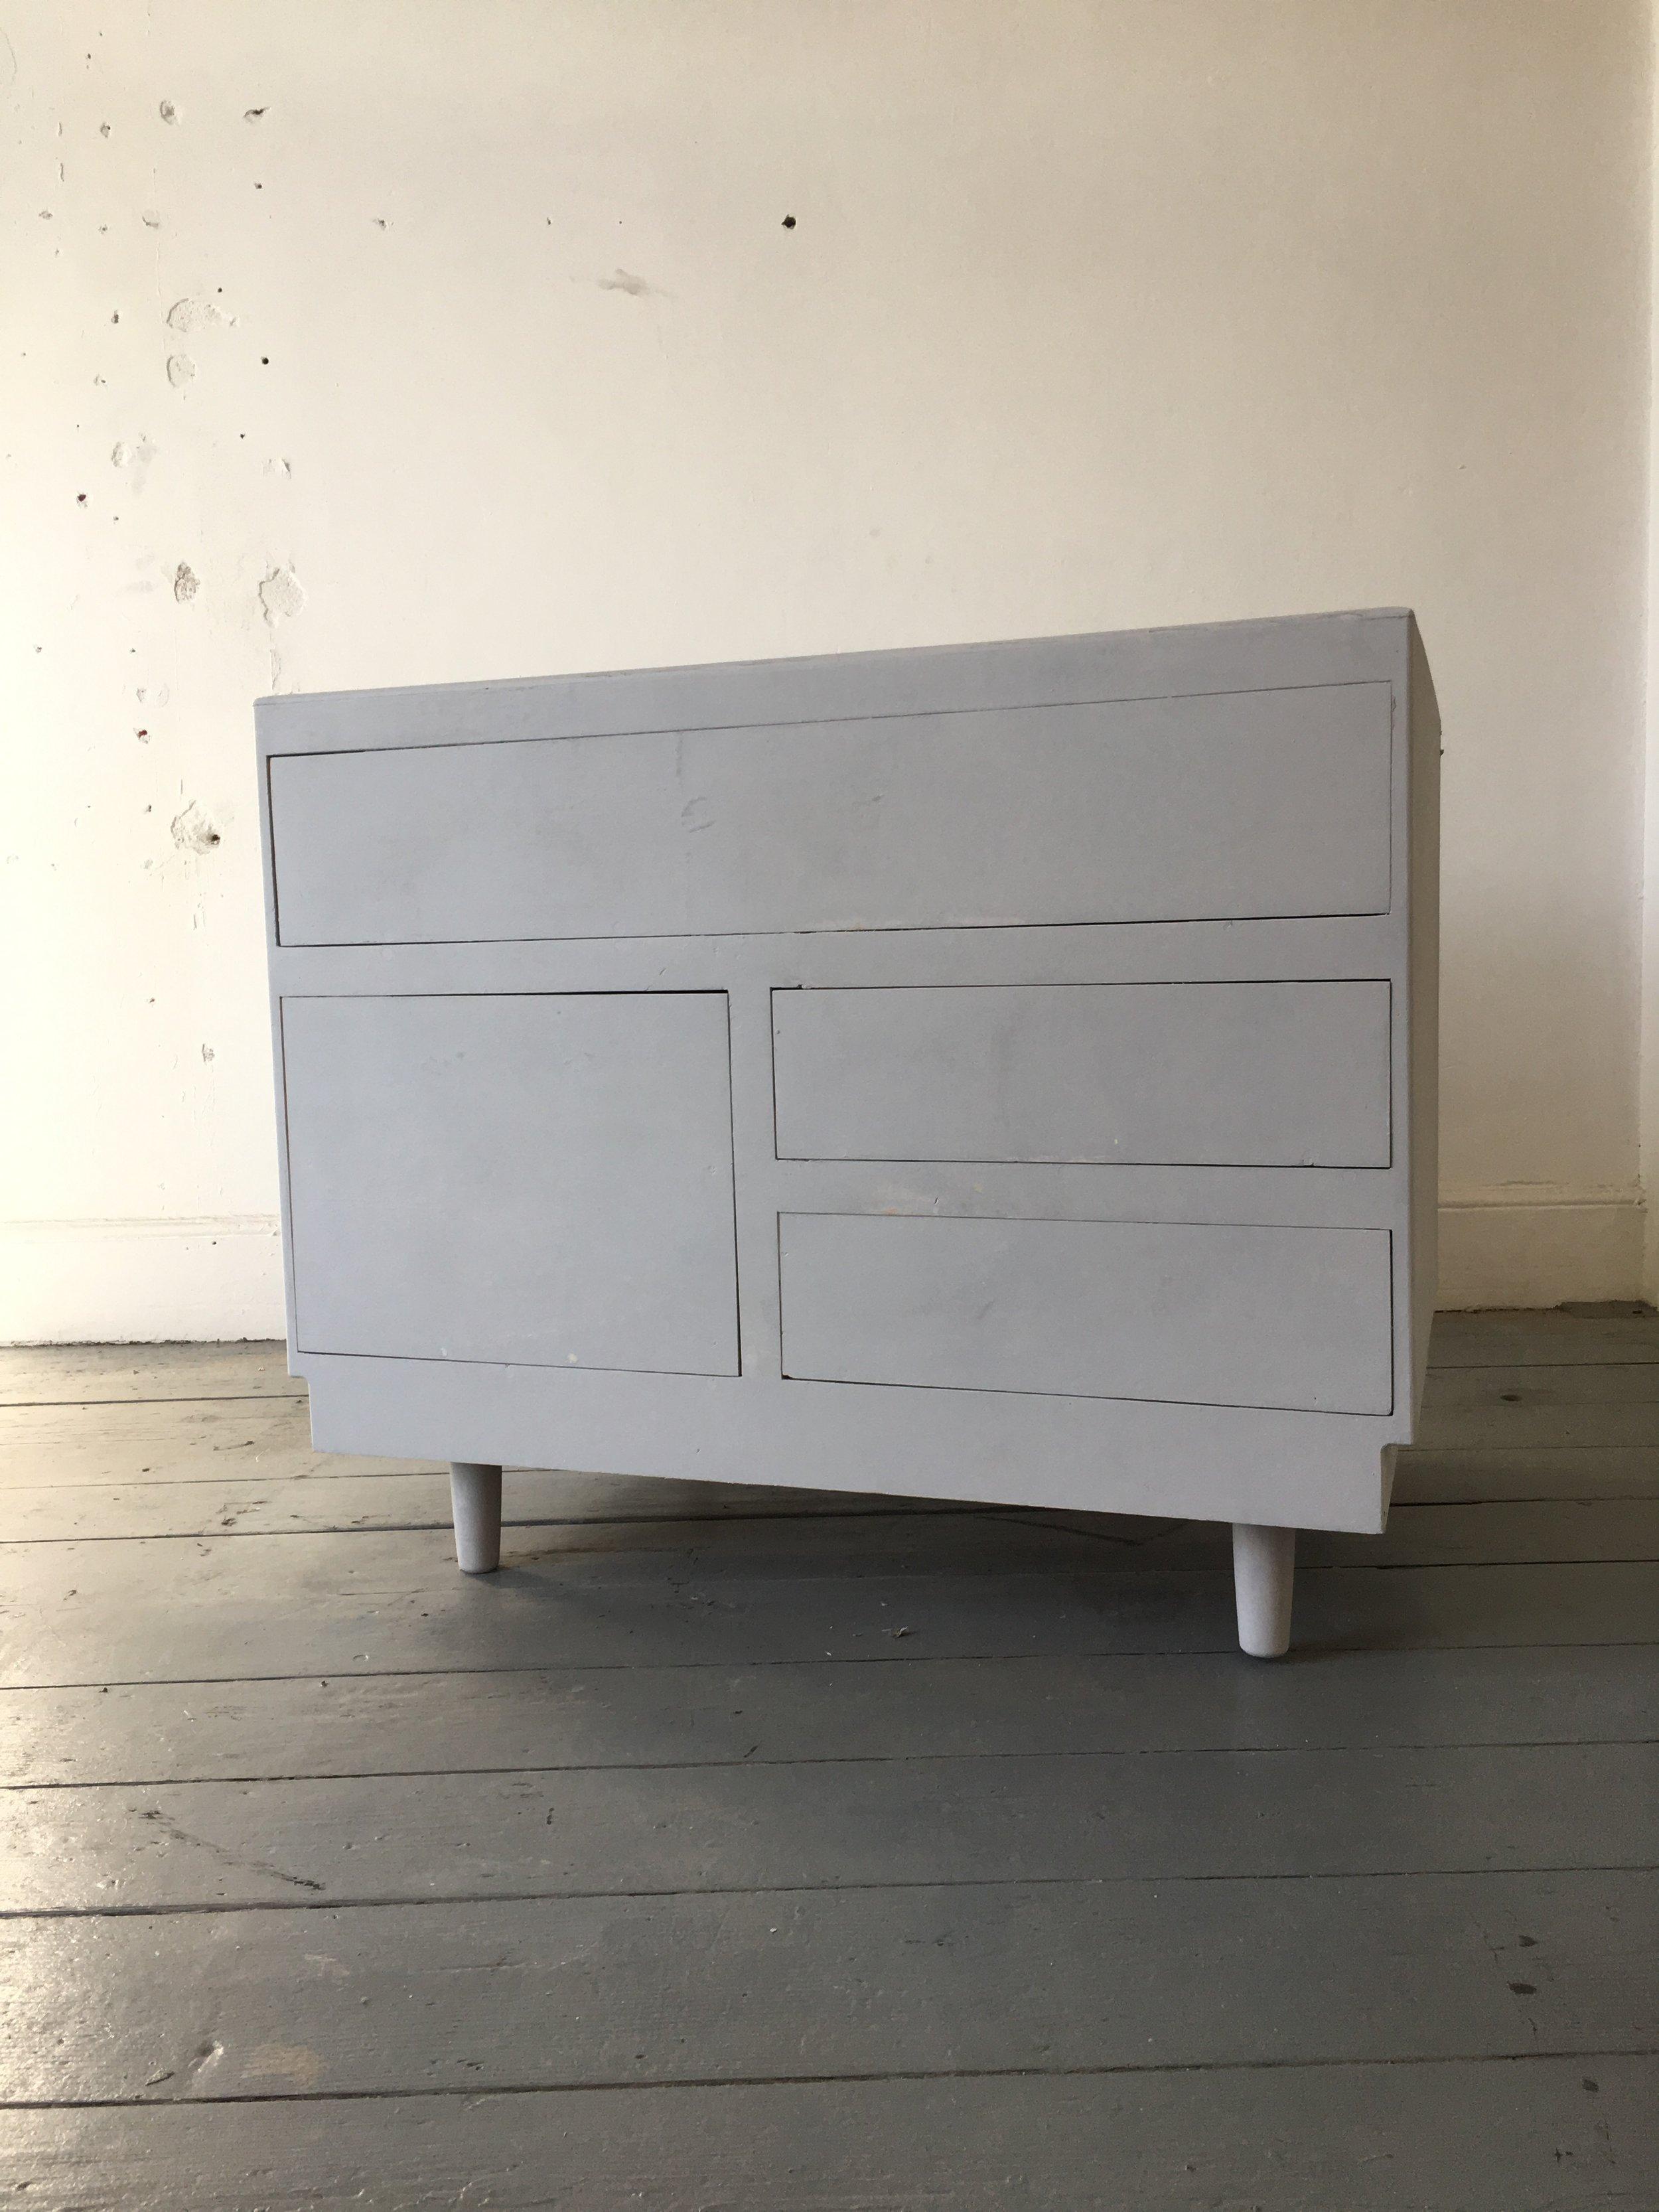 Crate, 2018